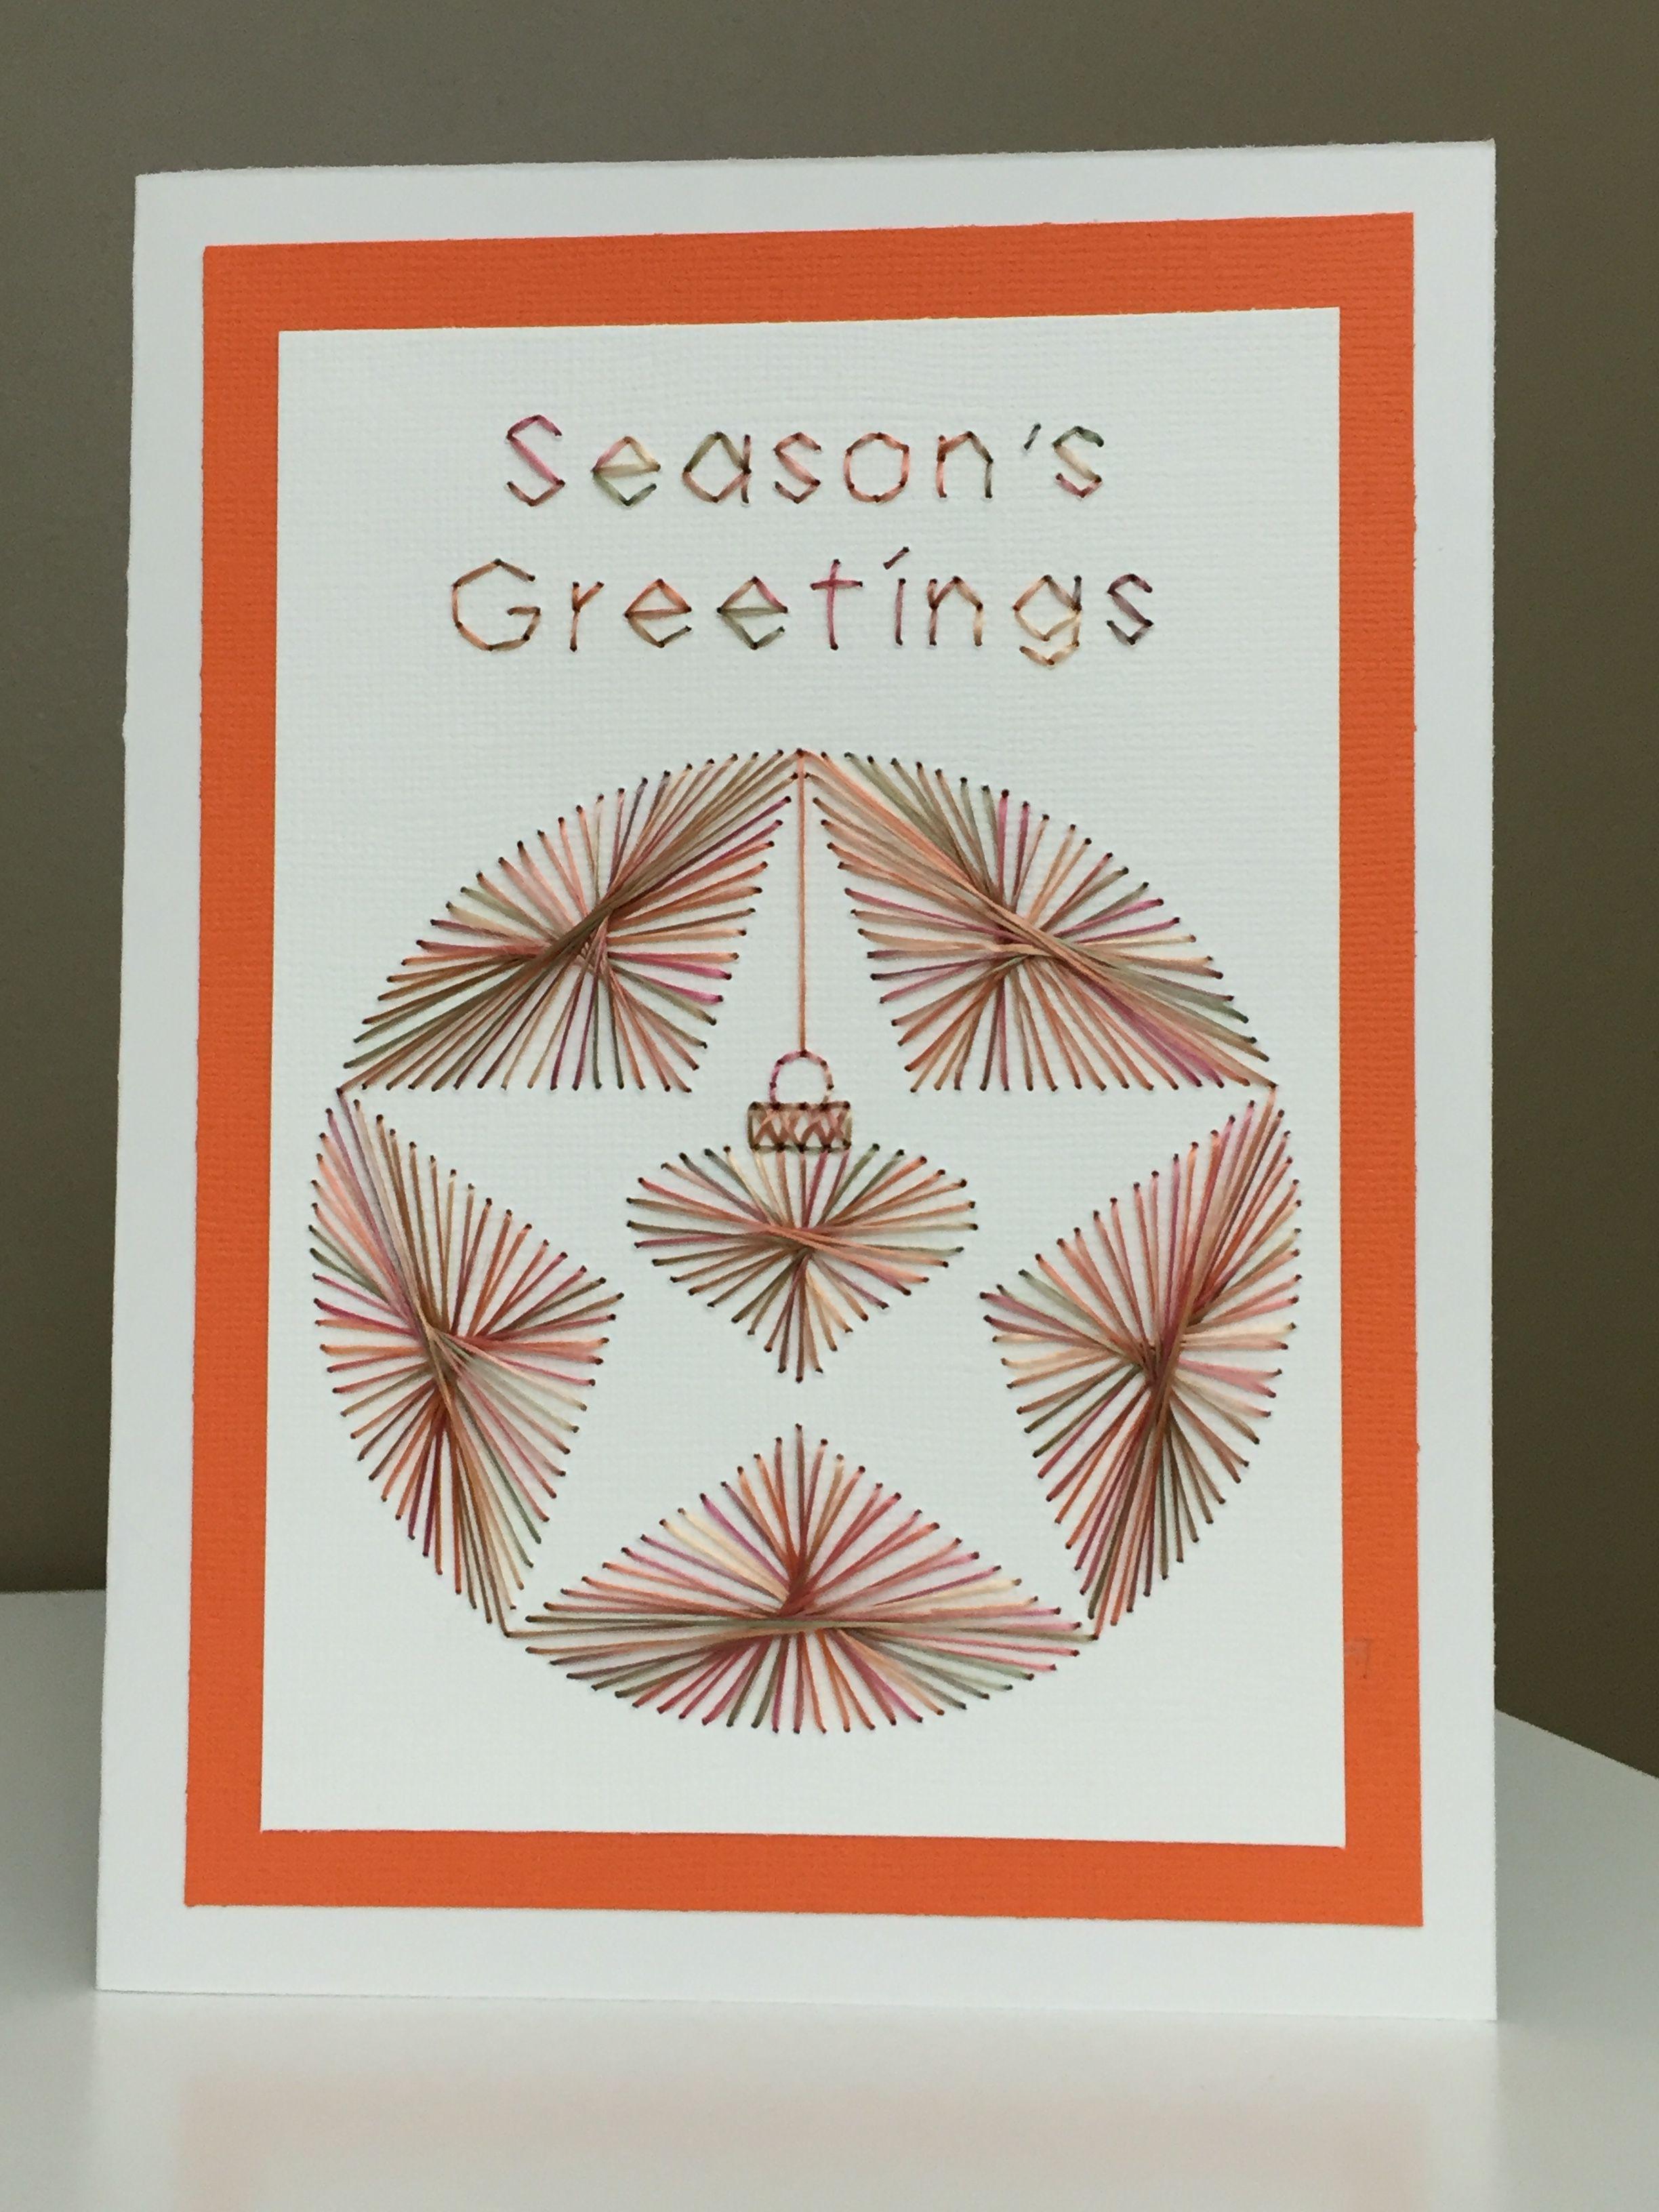 Design Christmas 23 Seasons Greetings Star Designer